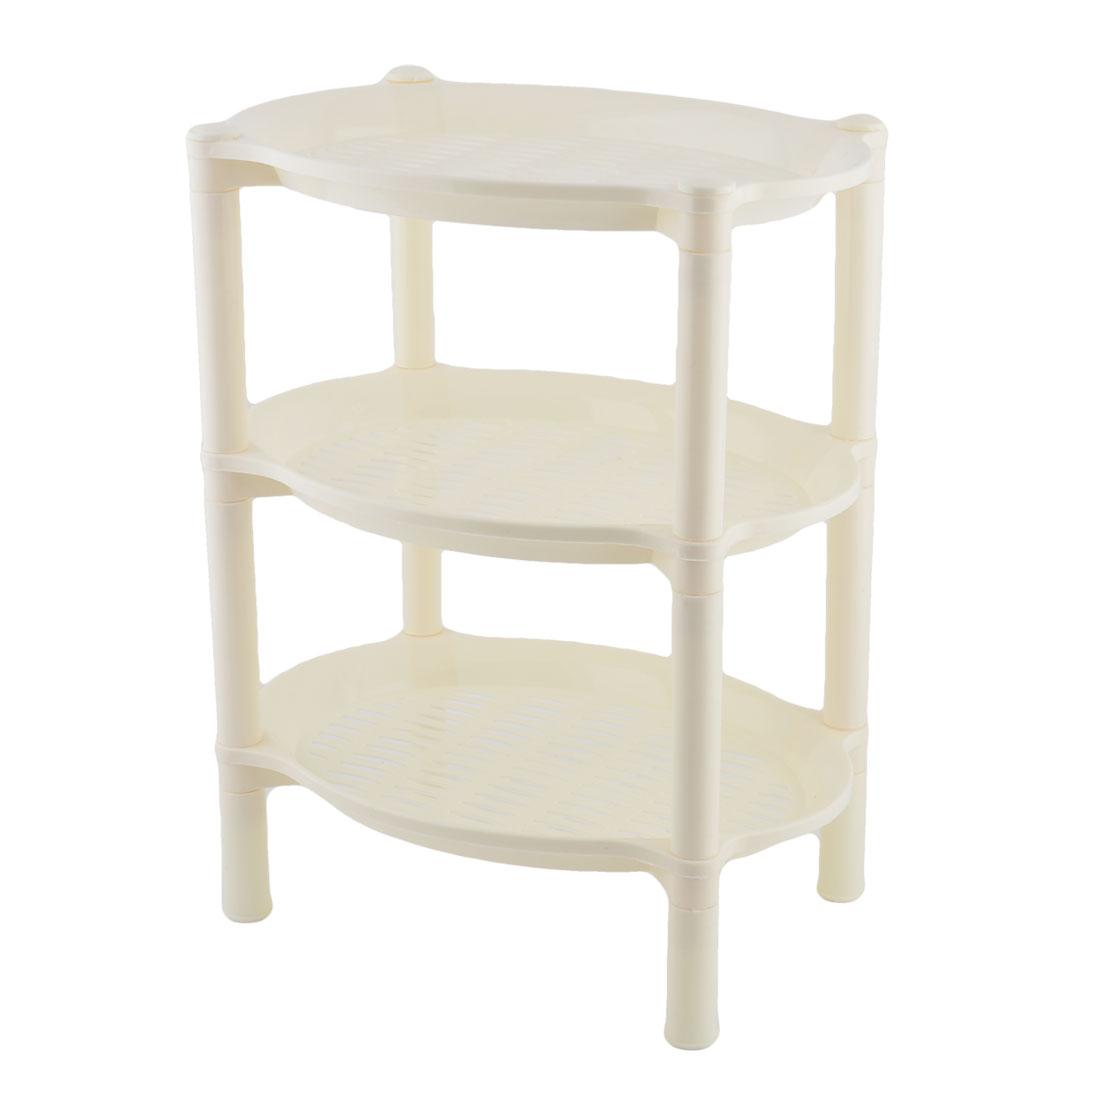 Household Bathroom Plastic Mini 3 Layer Shelf Storage Rack Organizer Beige